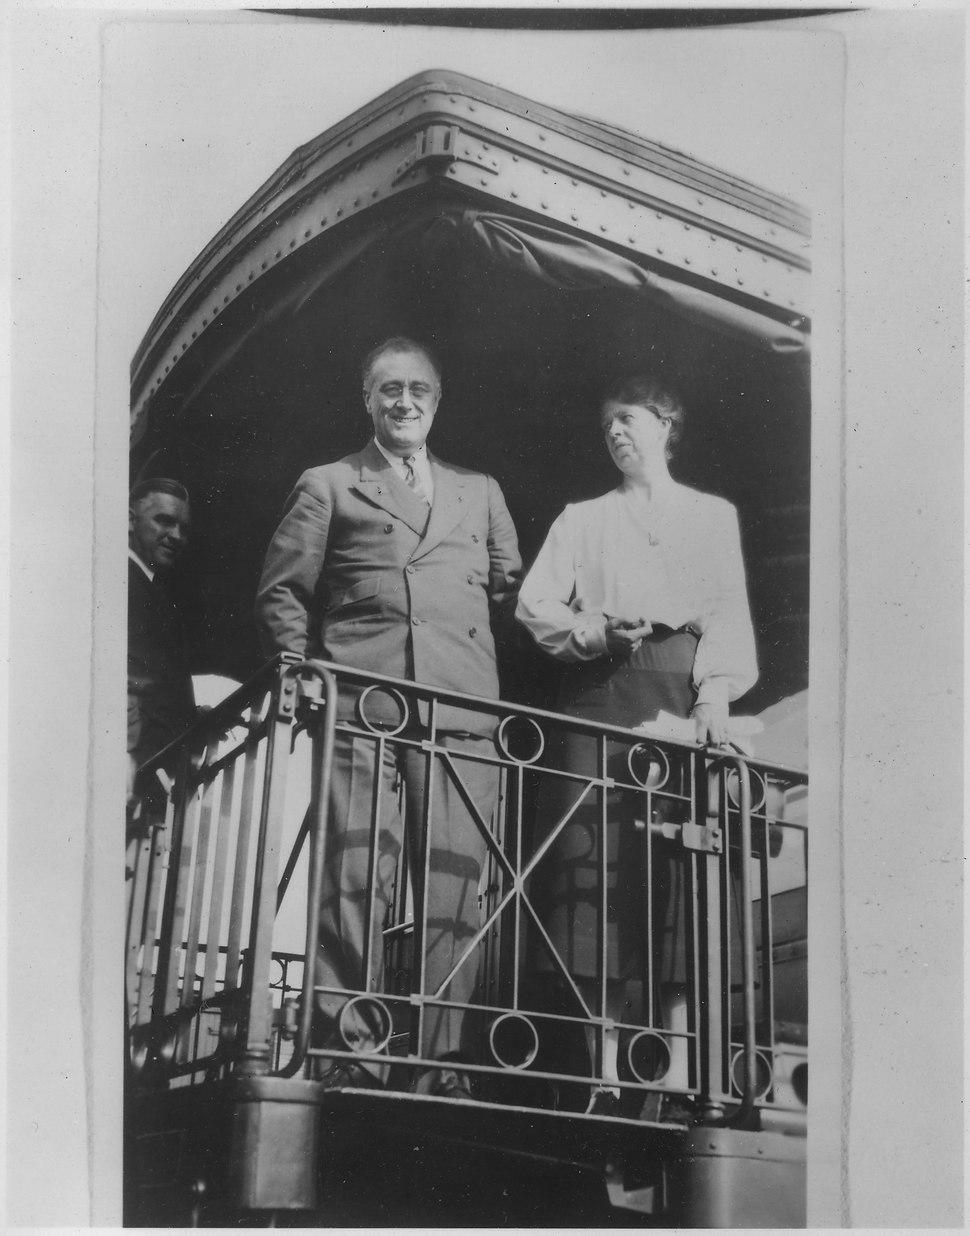 Franklin D. Roosevelt,Eleanor Roosevelt, and Earl Miller in Savannah, Illinois - NARA - 195405